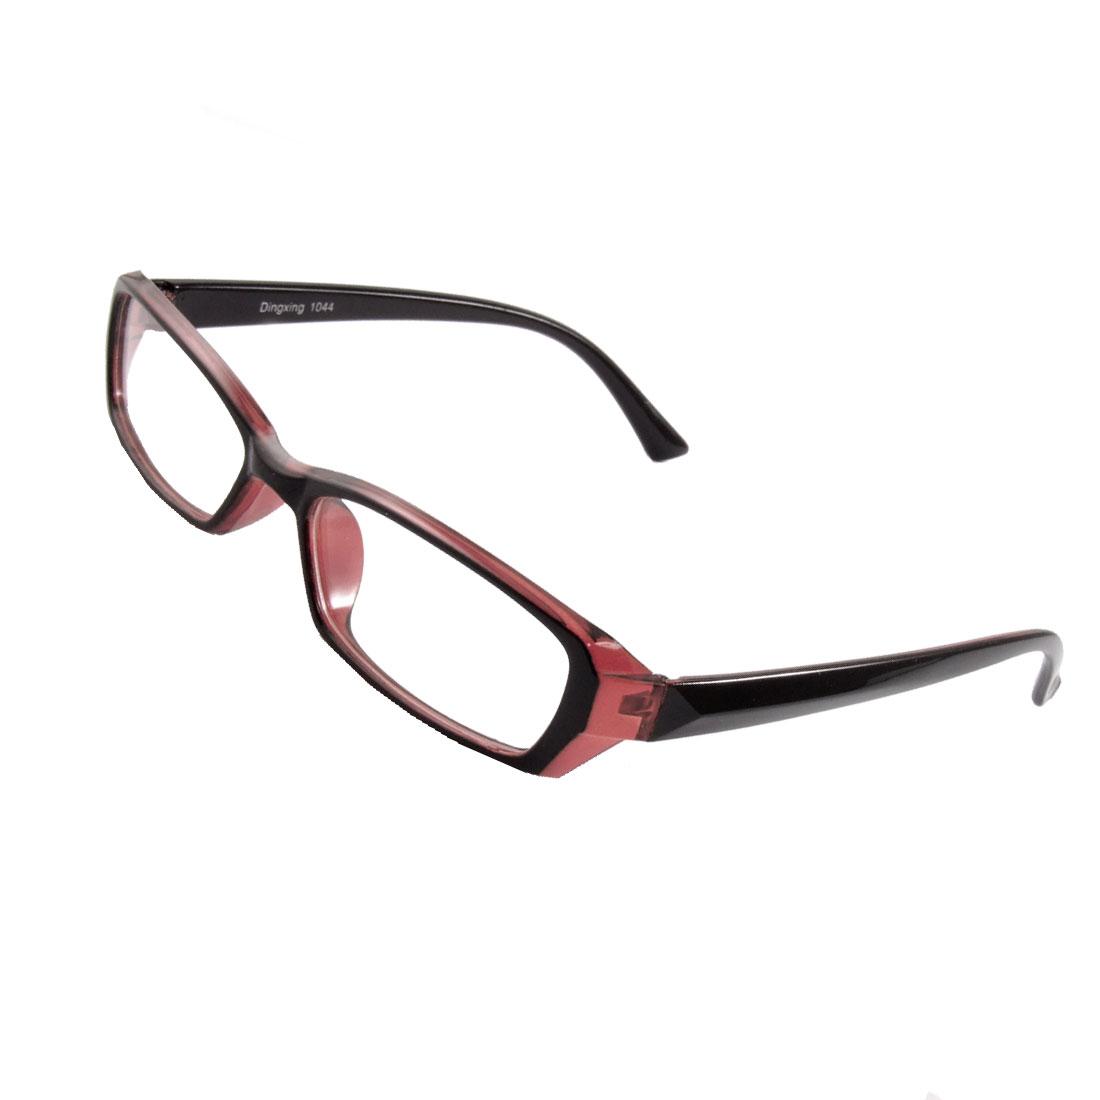 Unisex Black Burgundy Plastic Frame Arms Clear Lens Plain Glasses